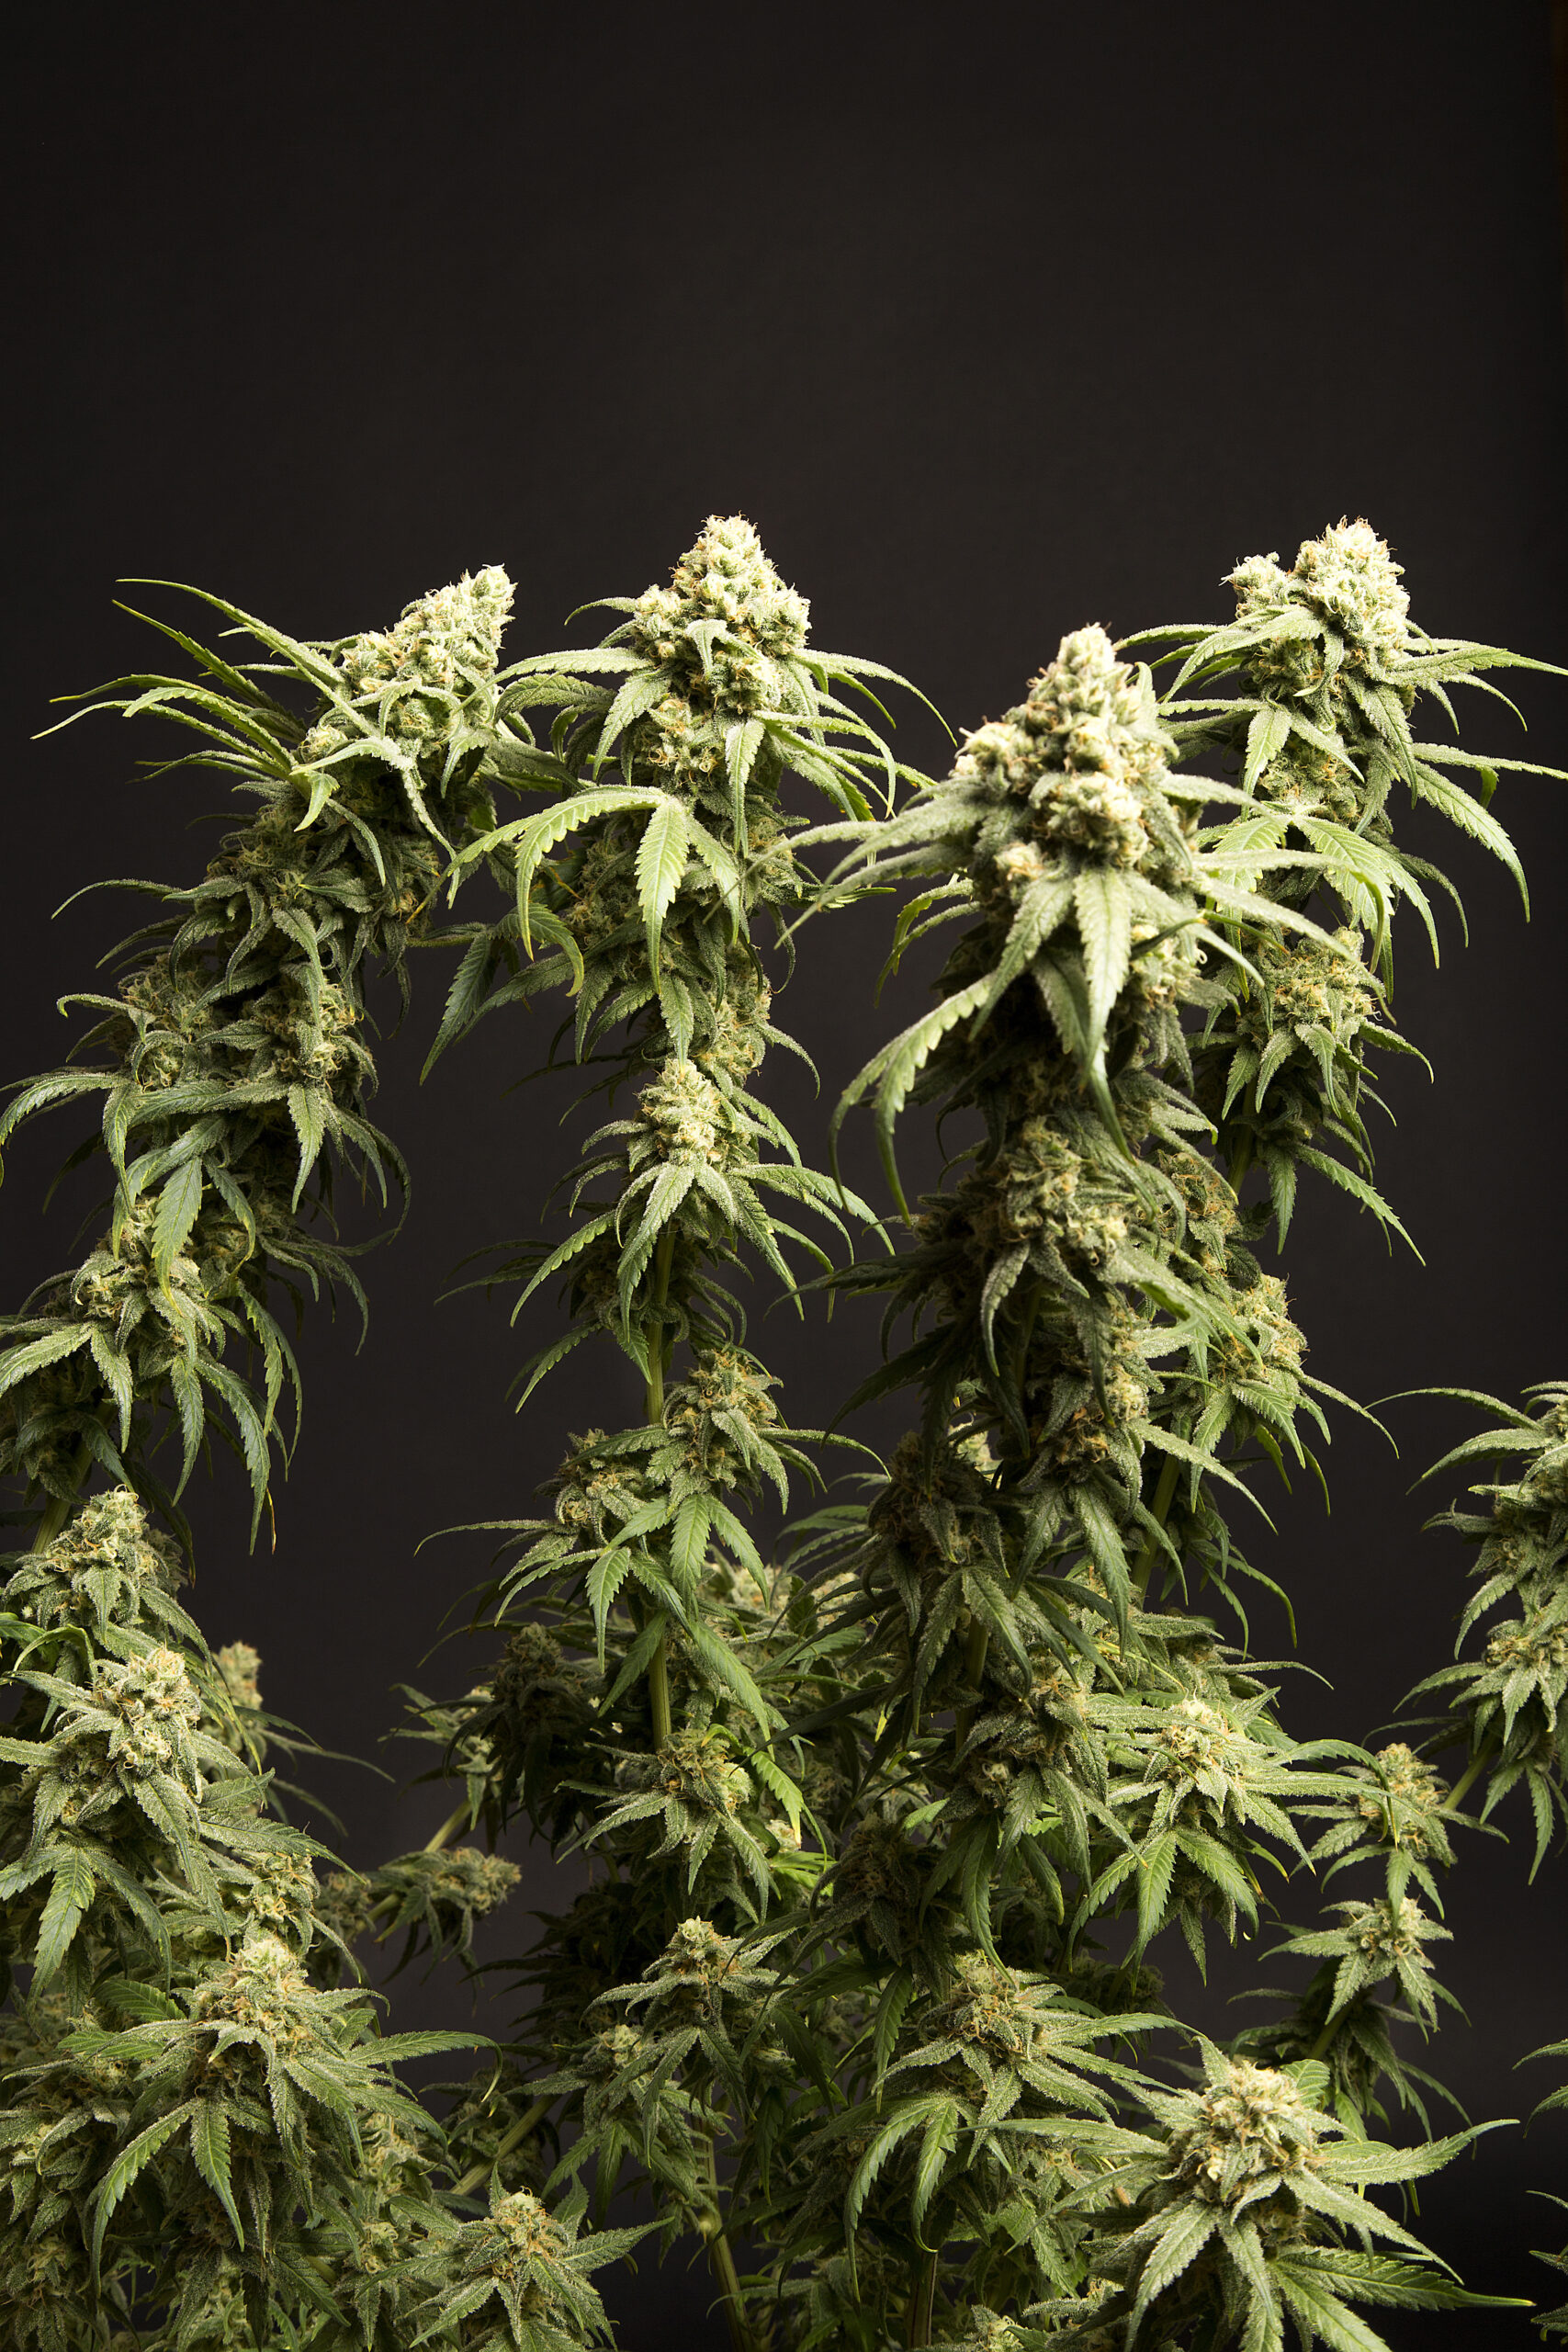 Lelen Ruete Cannabis Uruguay